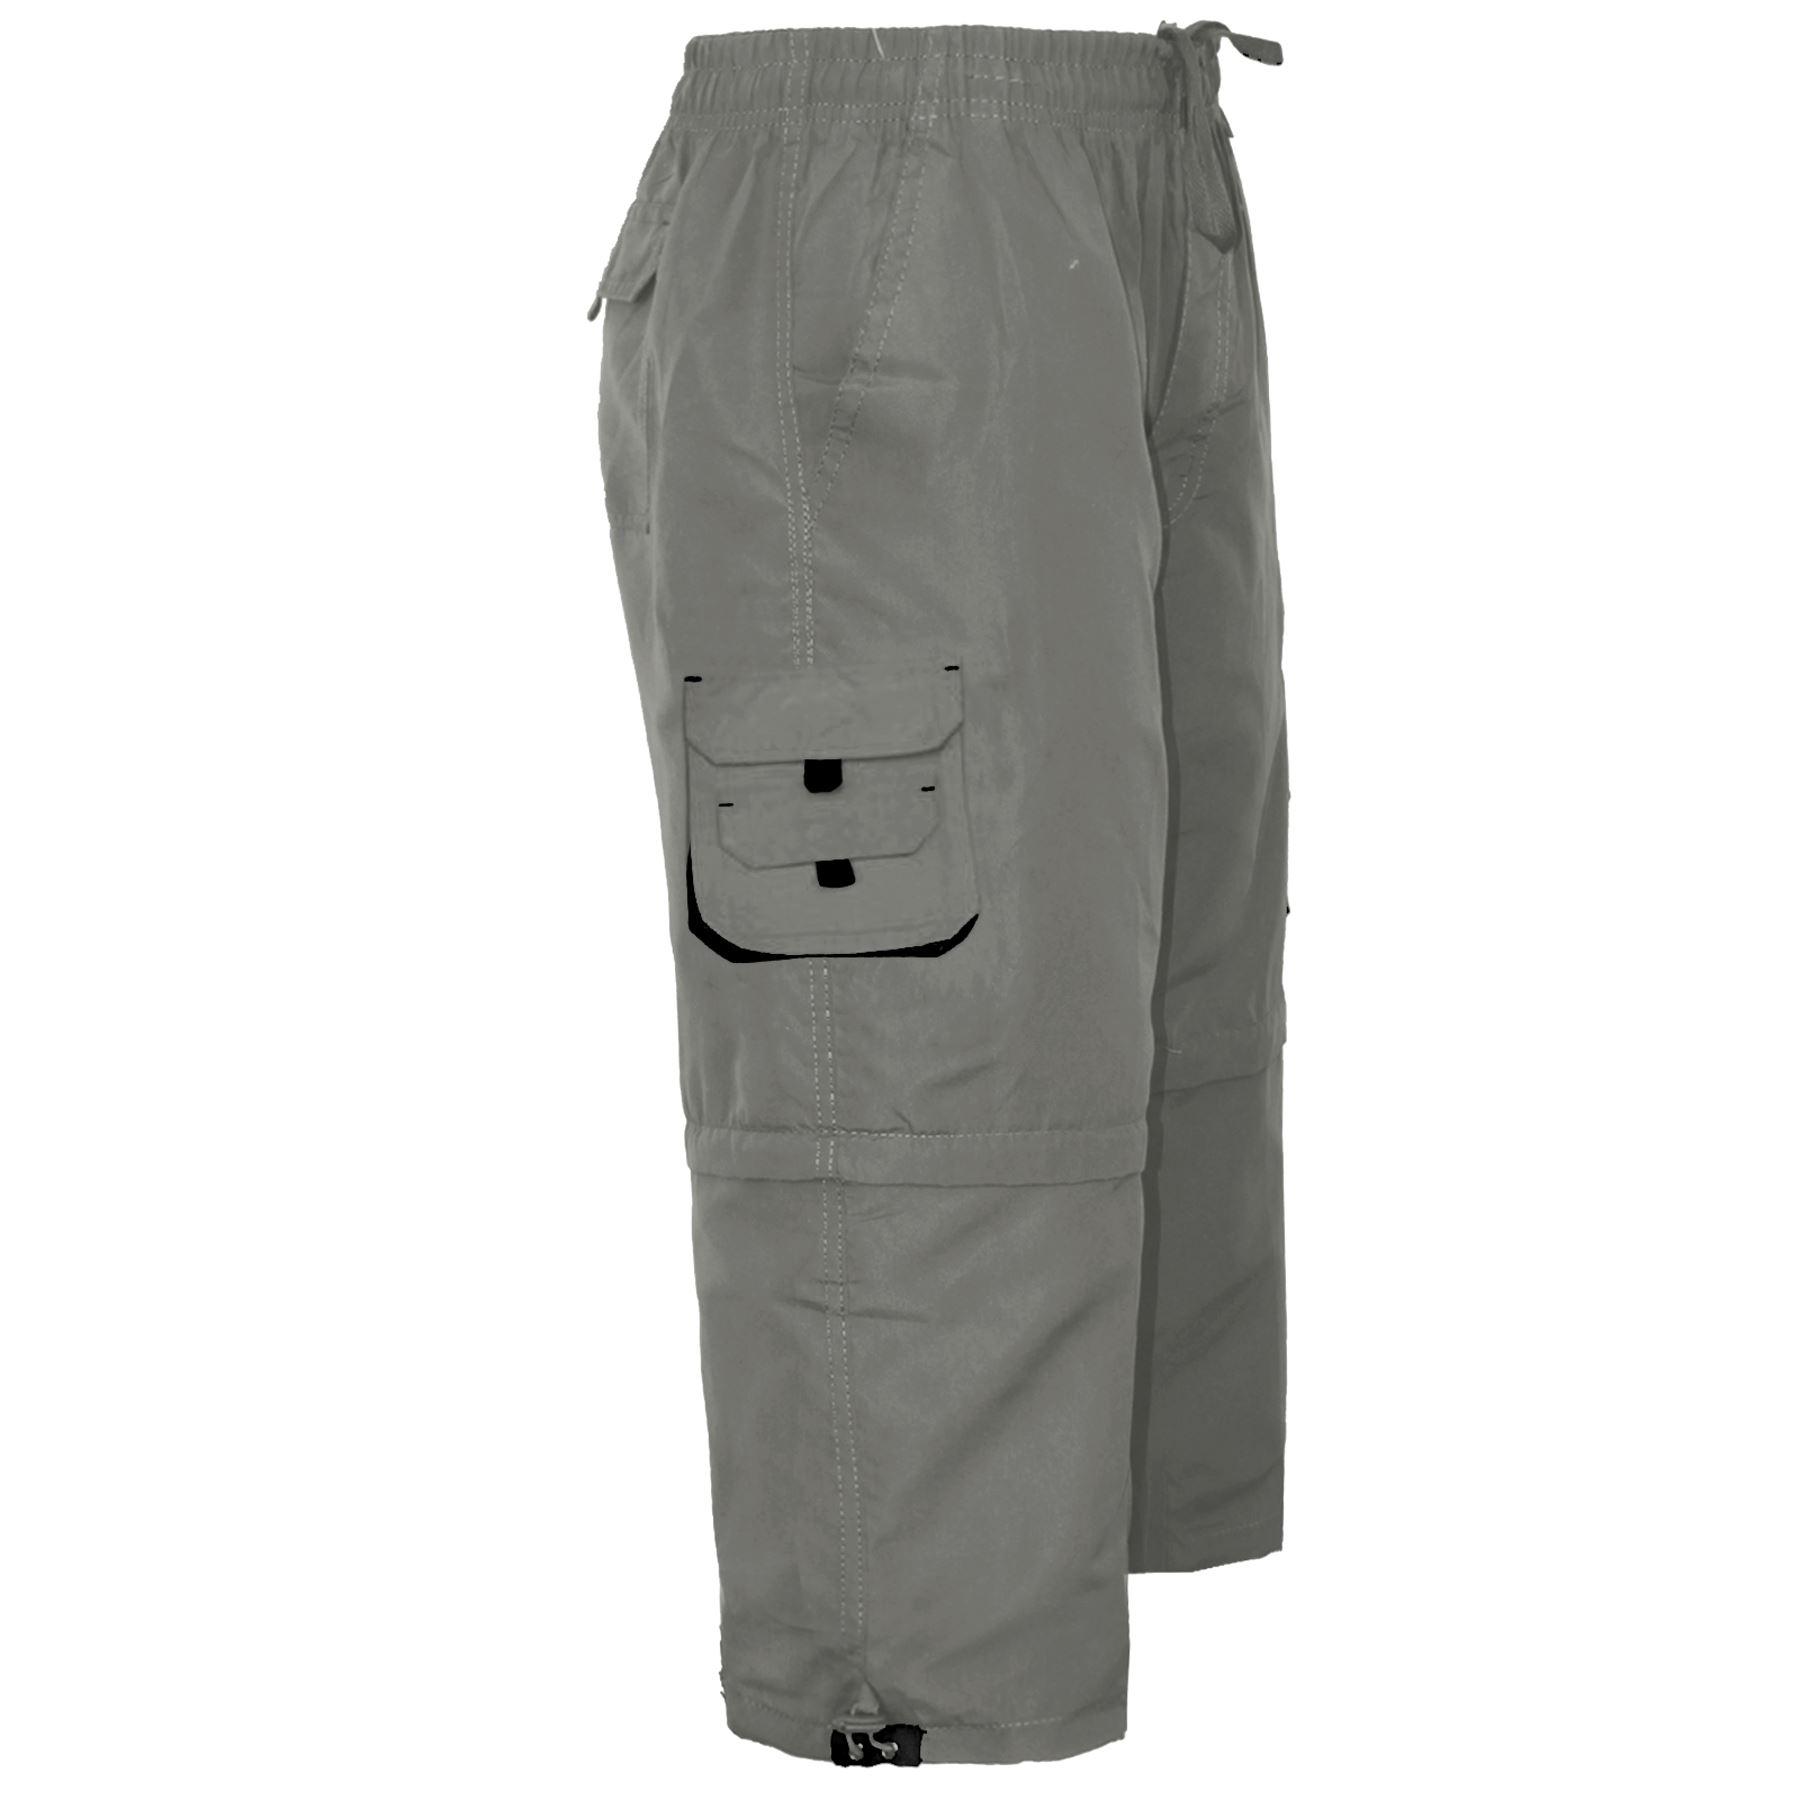 Da Uomo 2in1 Zip Off estivo al ginocchio lungo elastico in vita Cargo Combat Pantaloncini